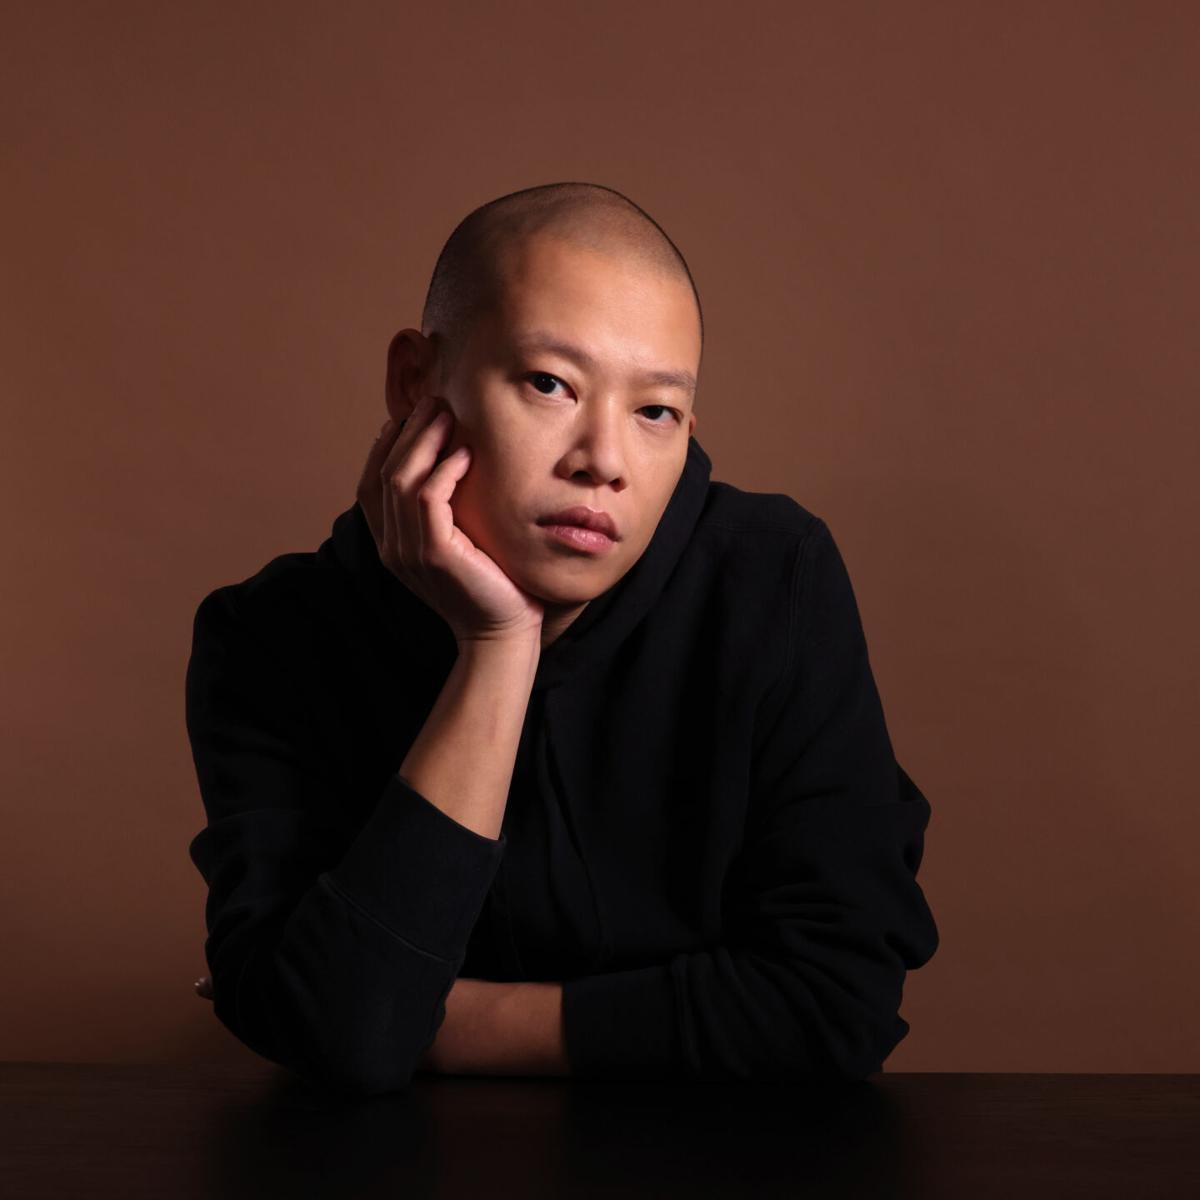 Jason Wu Portrait_2021_photographed by Jayme Thornton.jpg